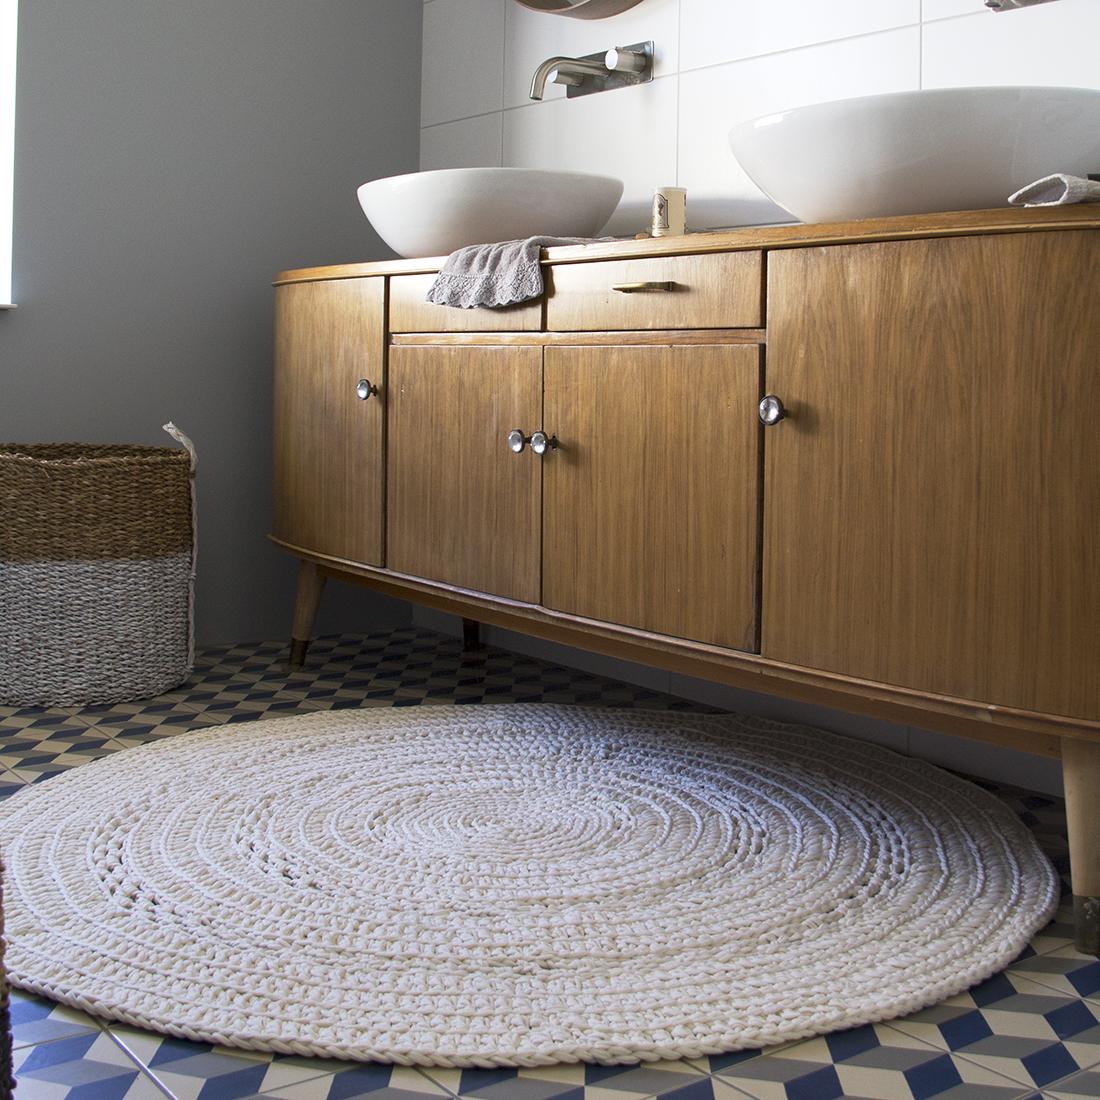 Badkamer trends 2018 tg wonen woonmagazine - Badkamer badkamer meubels ...